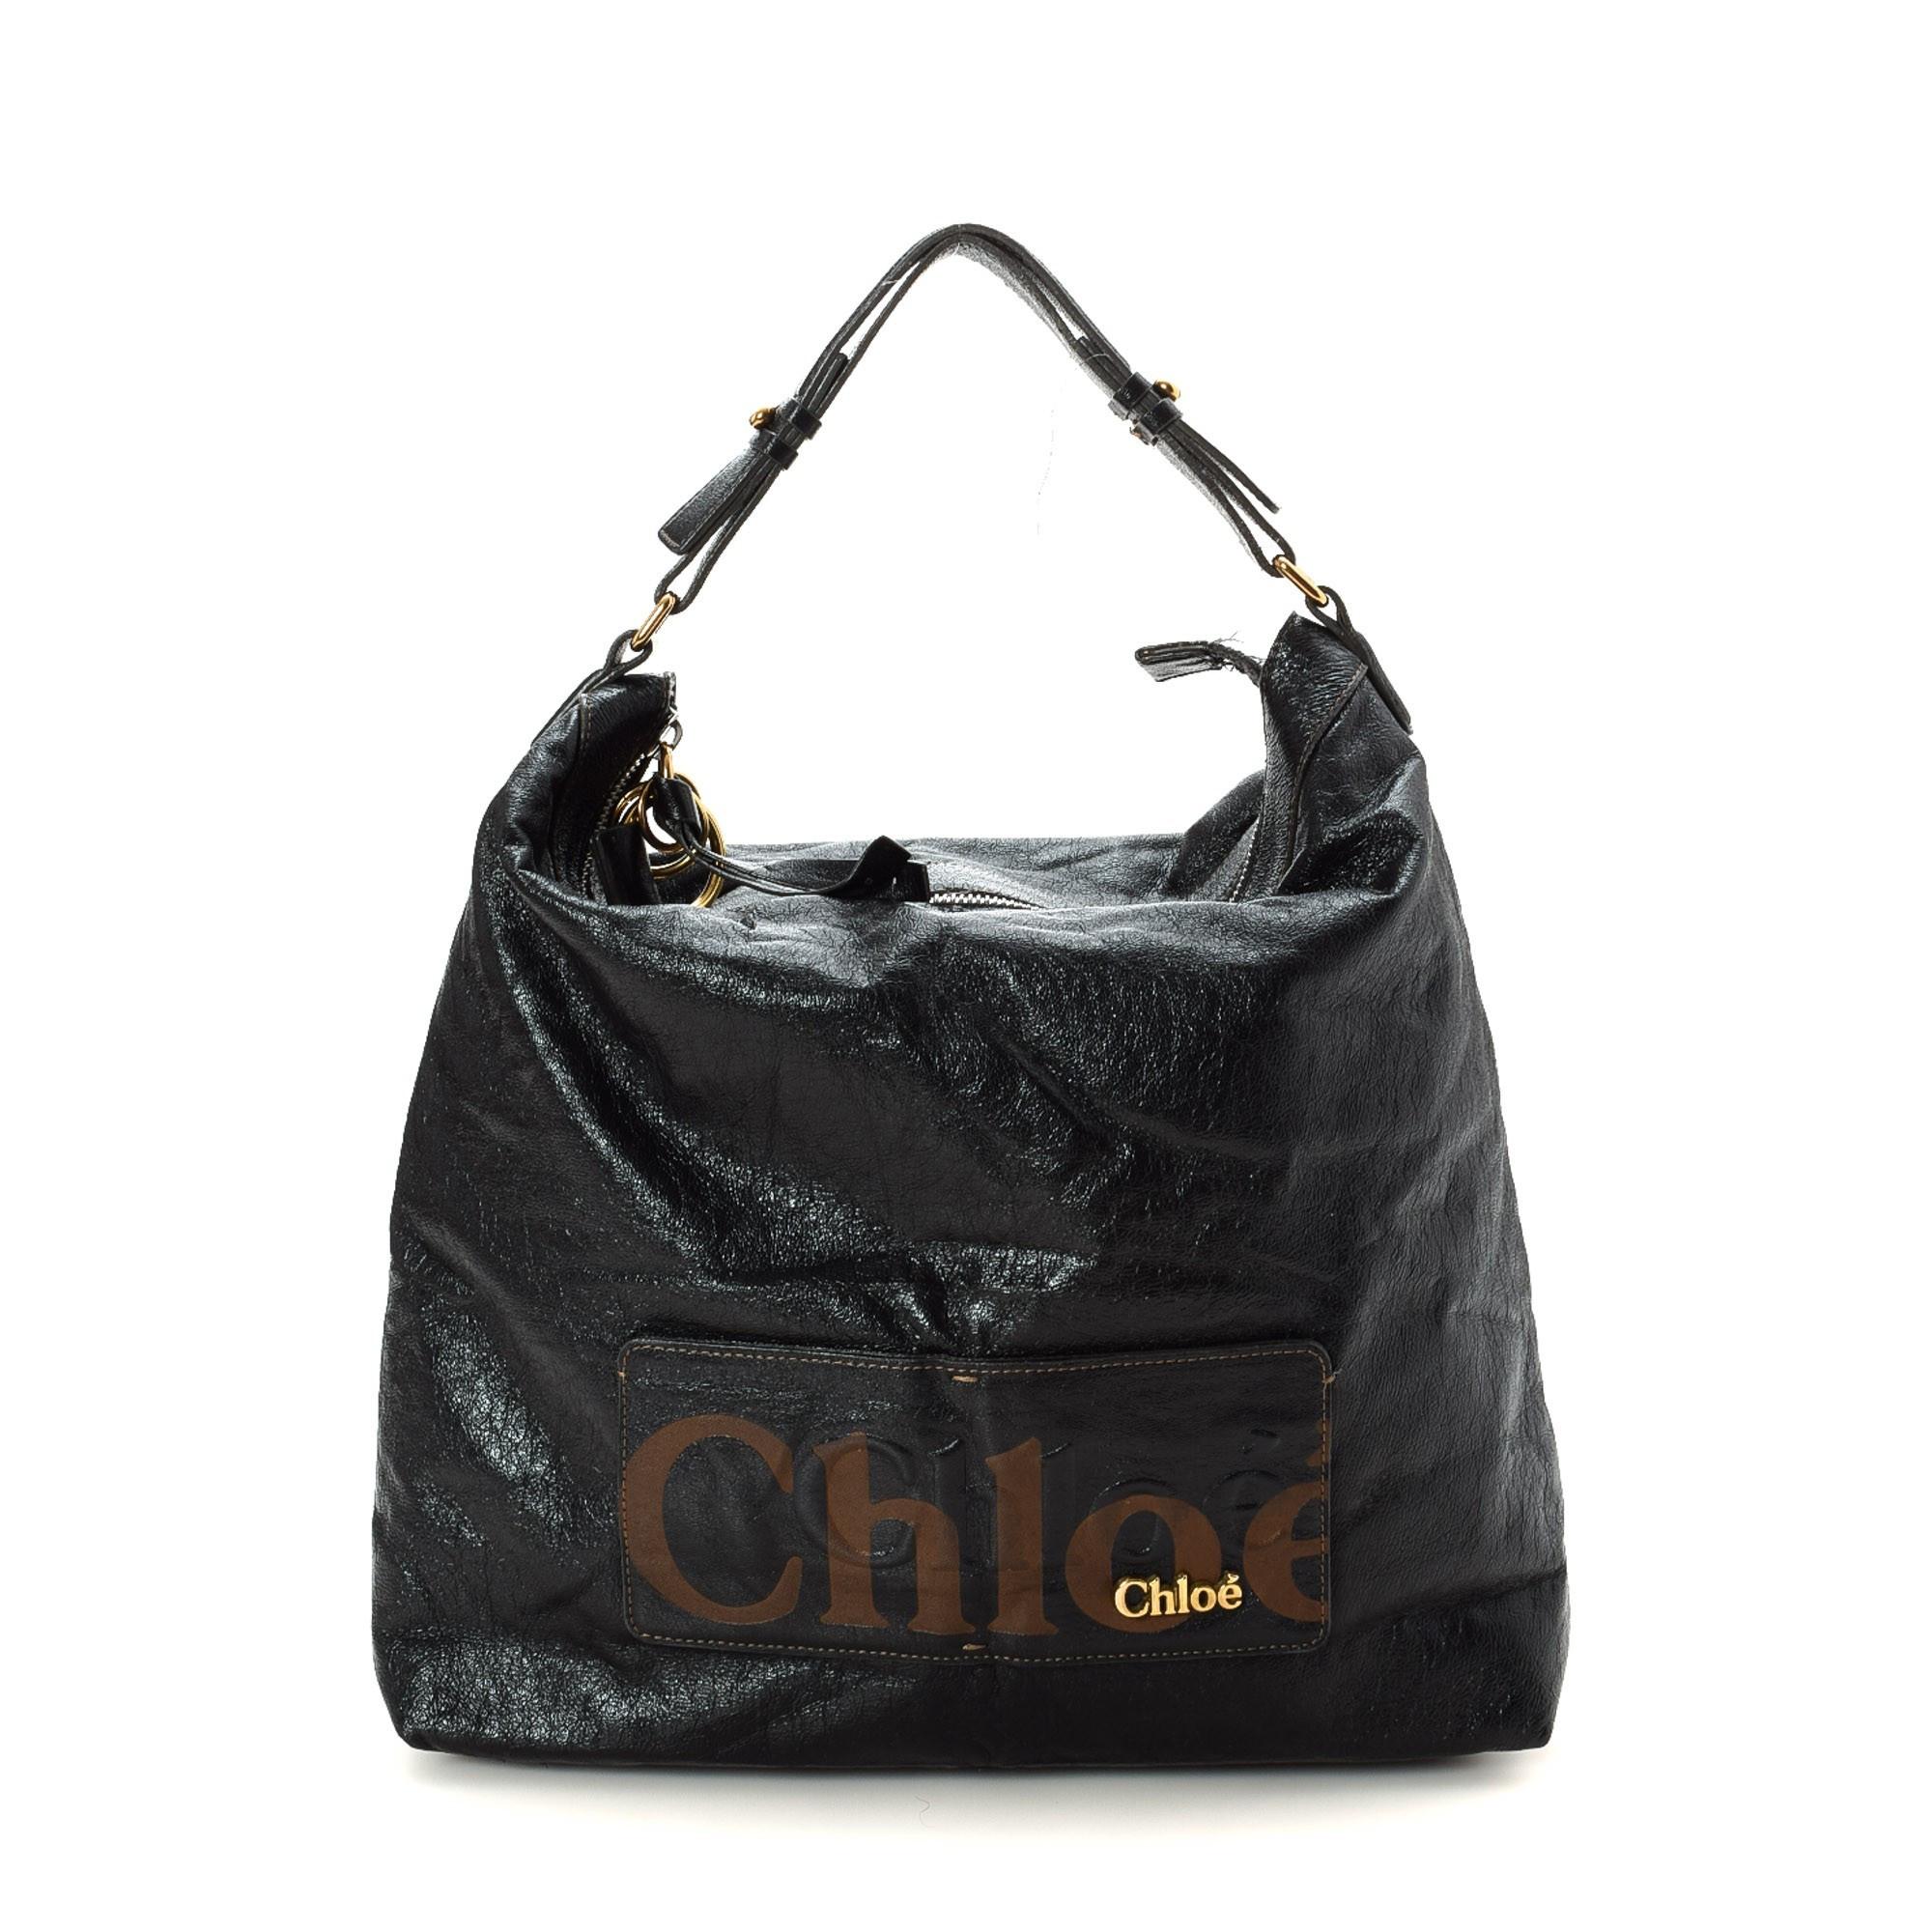 Chloé Eclipse Hobo Black Leather Shoulder Bag LXRCO